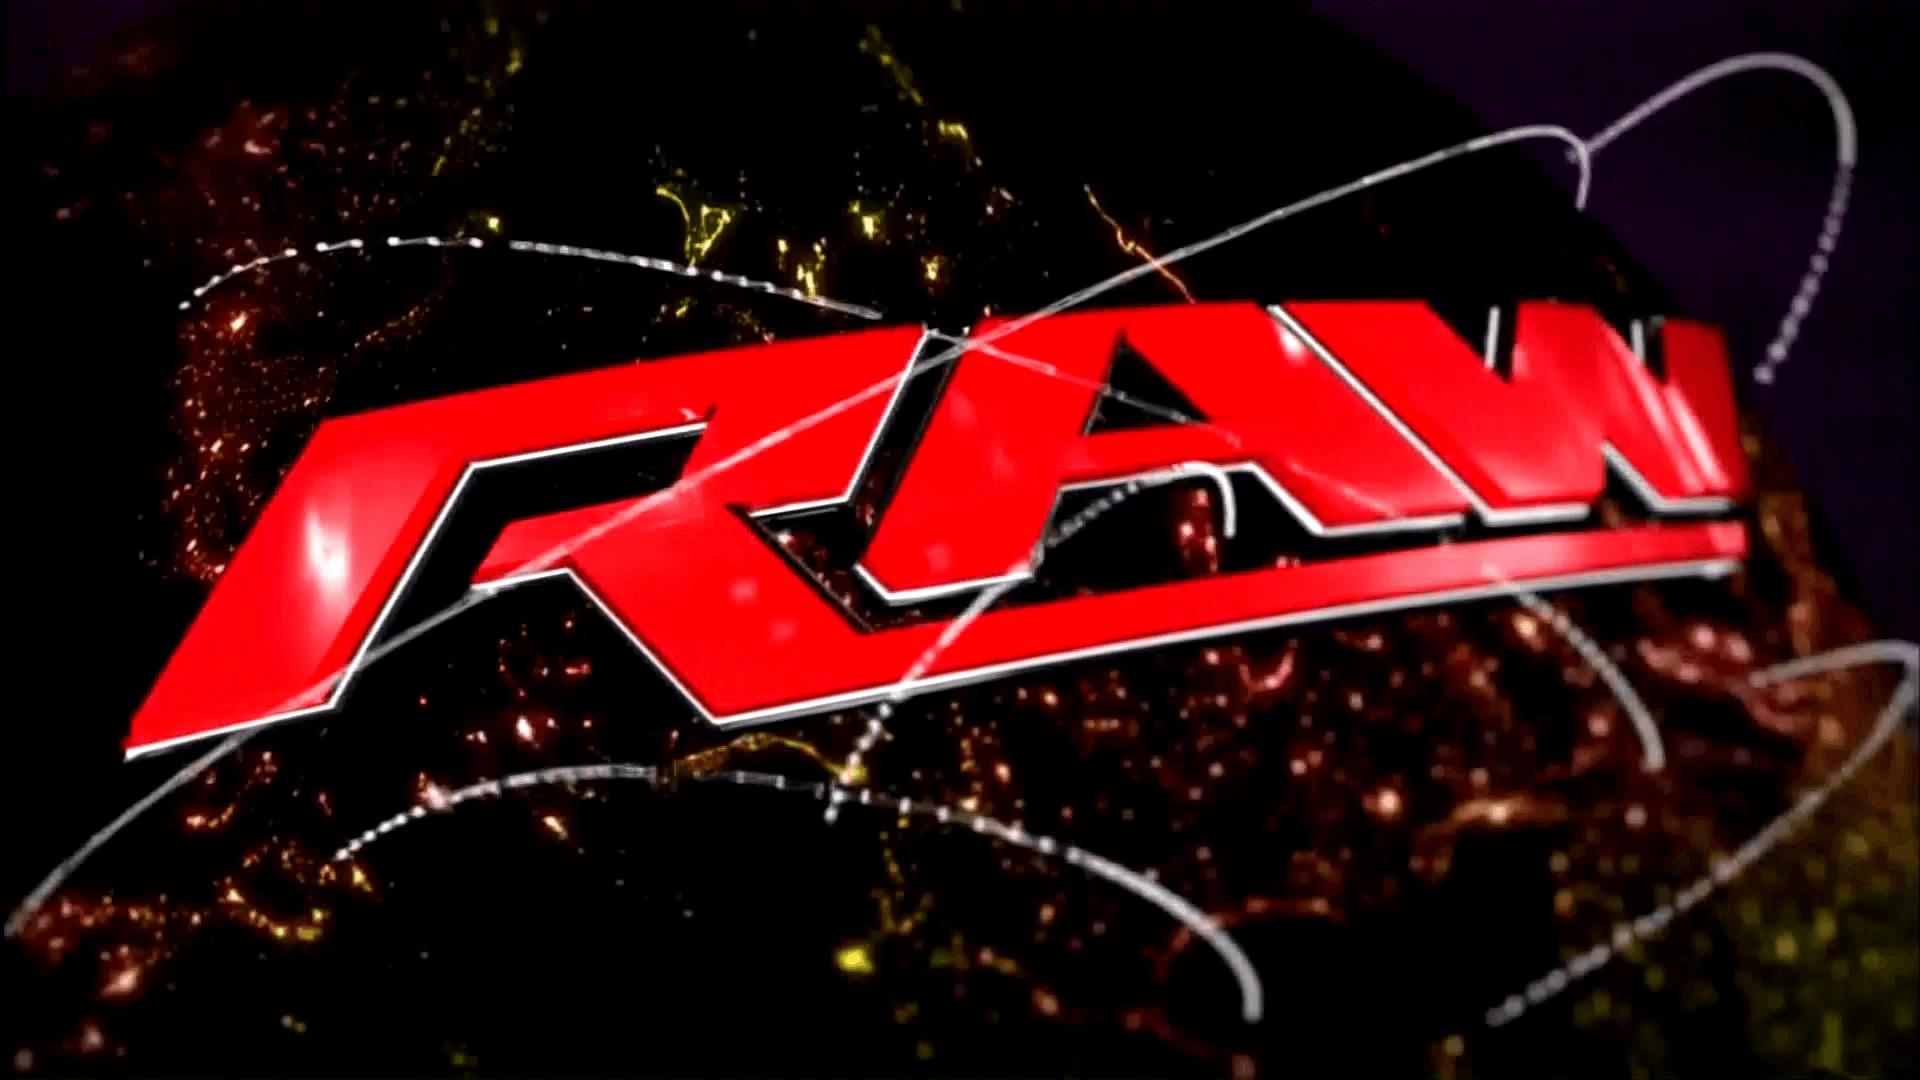 Braun Strowman Hd Wallpaper Wwe Raw Logo Wallpaper 82 Images